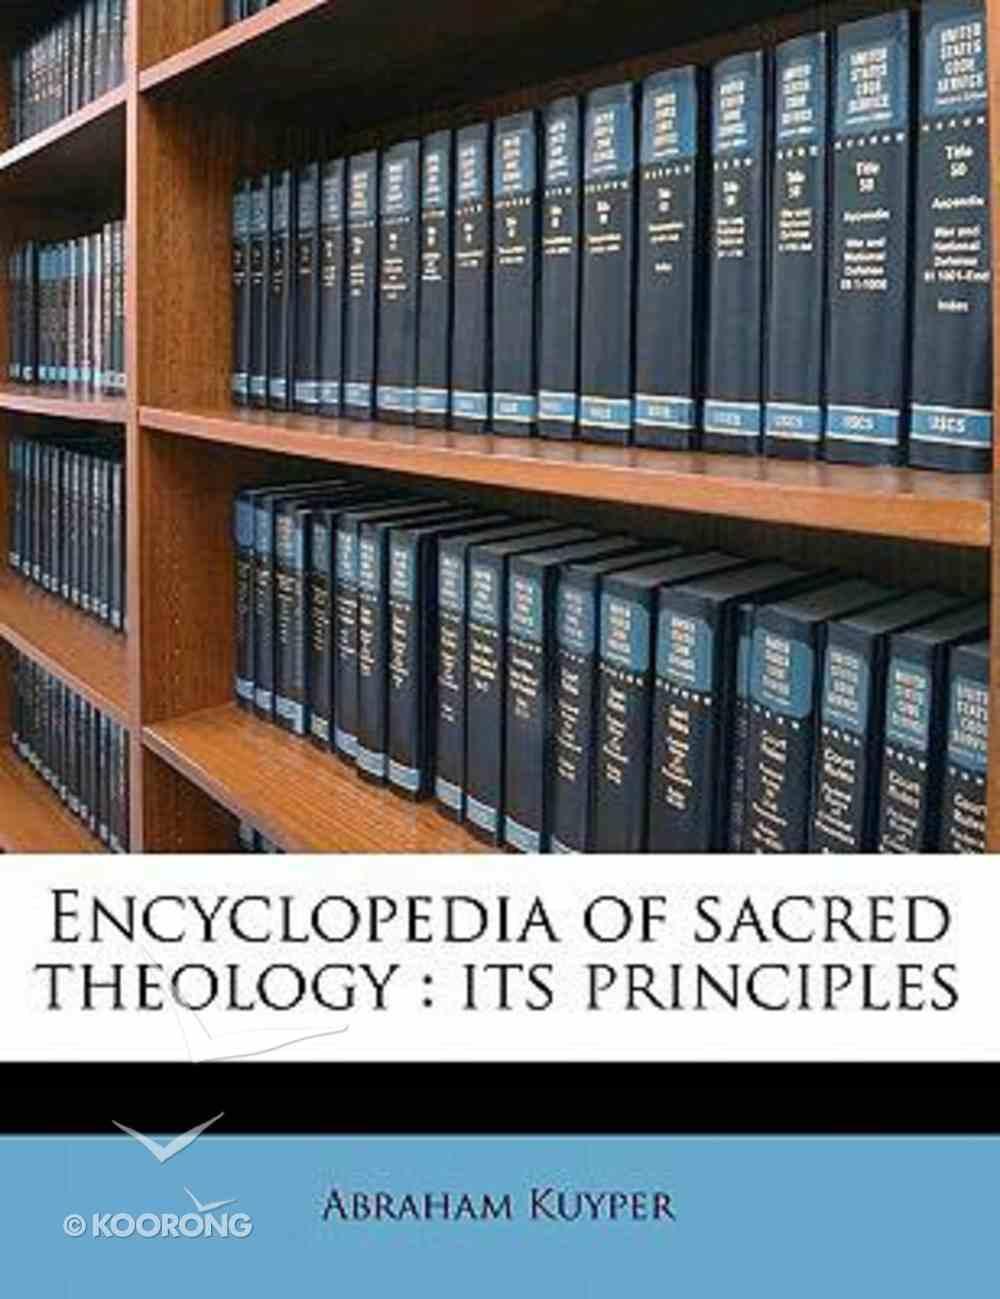 Encyclopedia of Sacred Theology: Its Principles Paperback